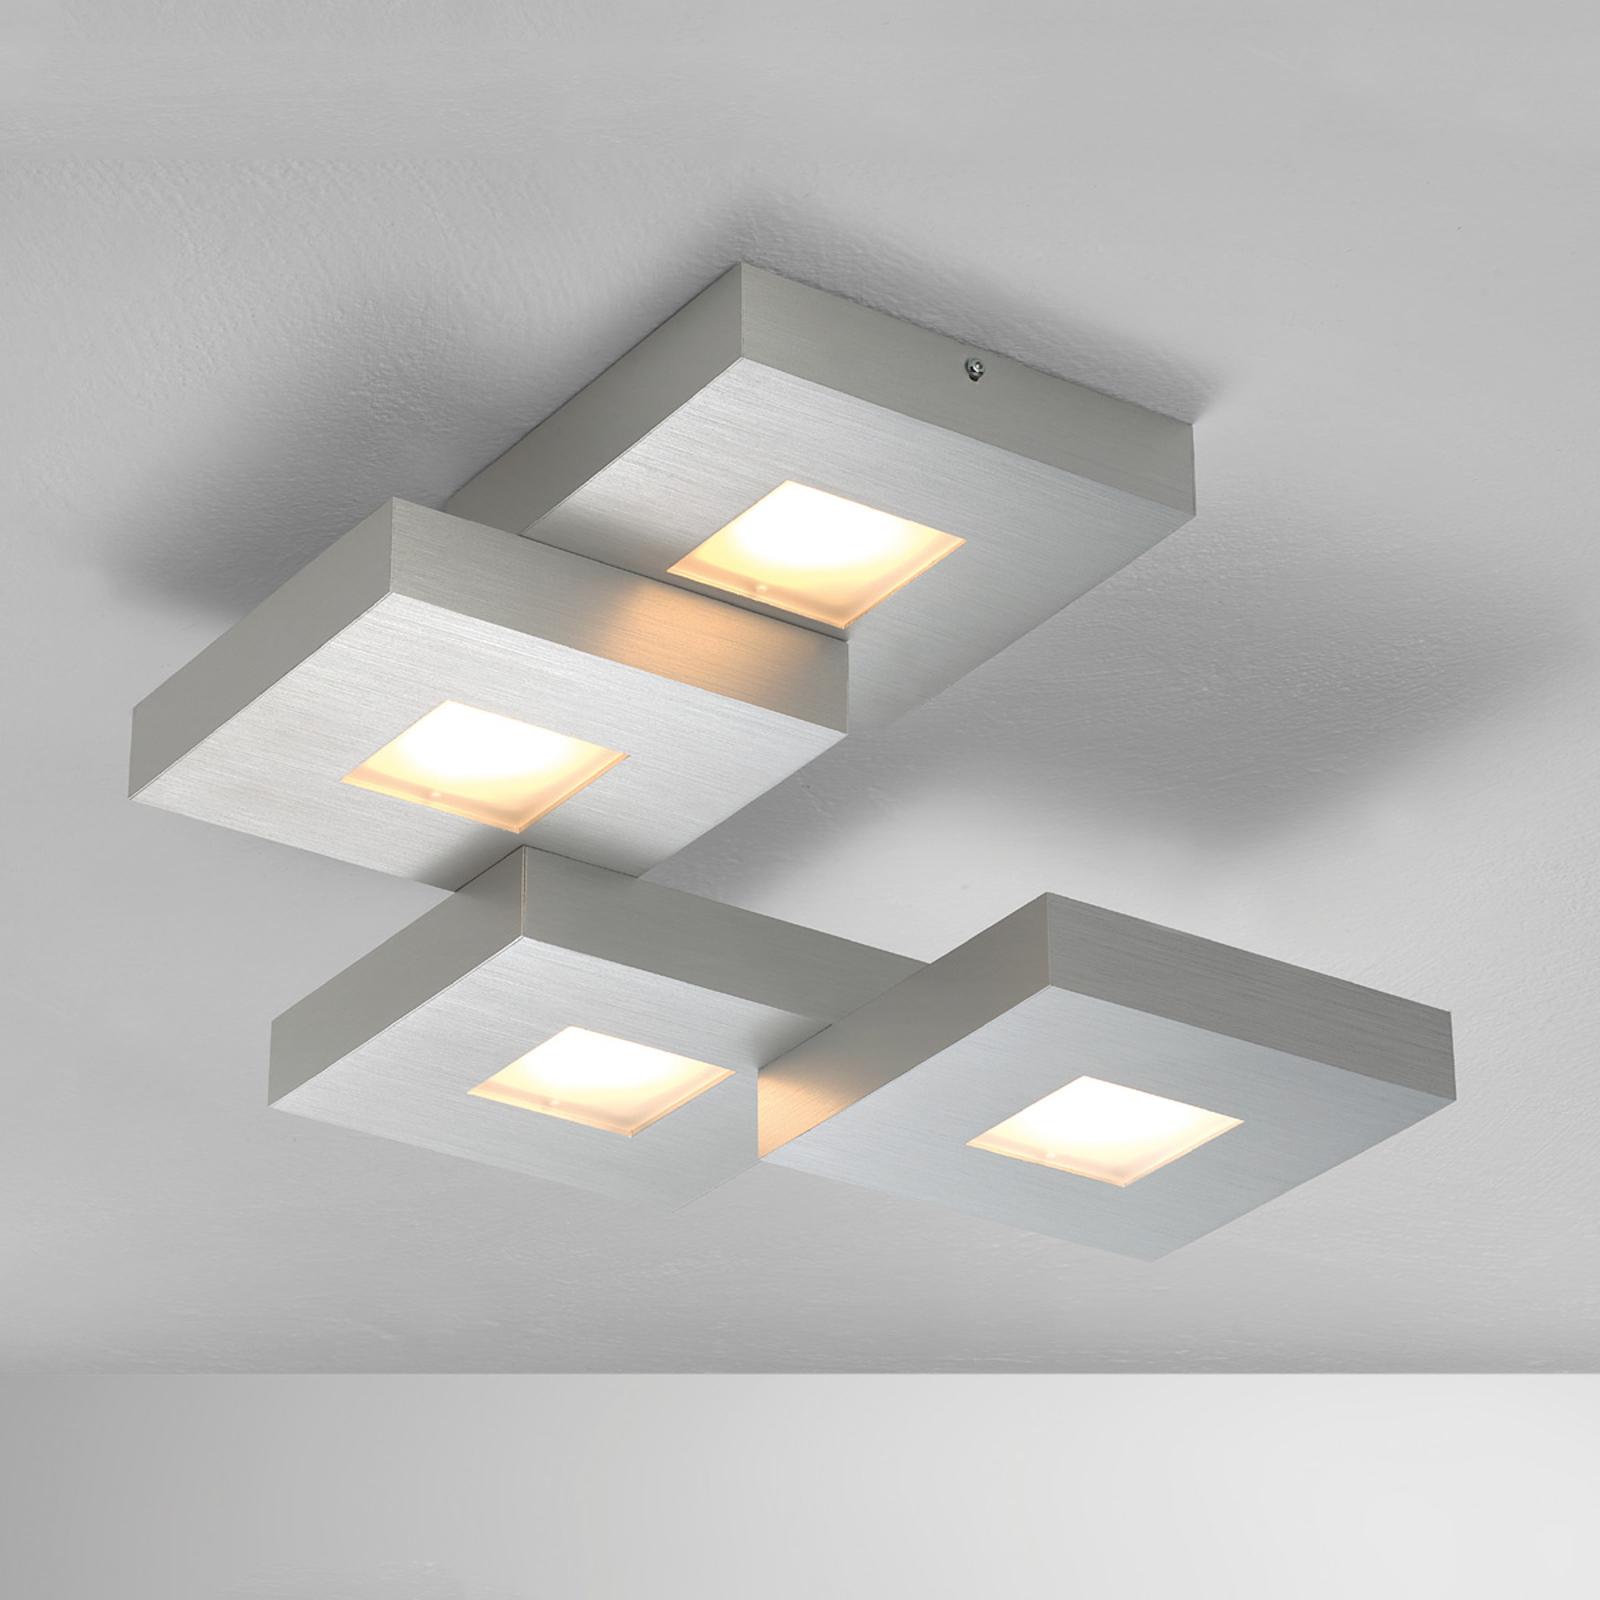 Trappeformet LED-loftslampe Cubus